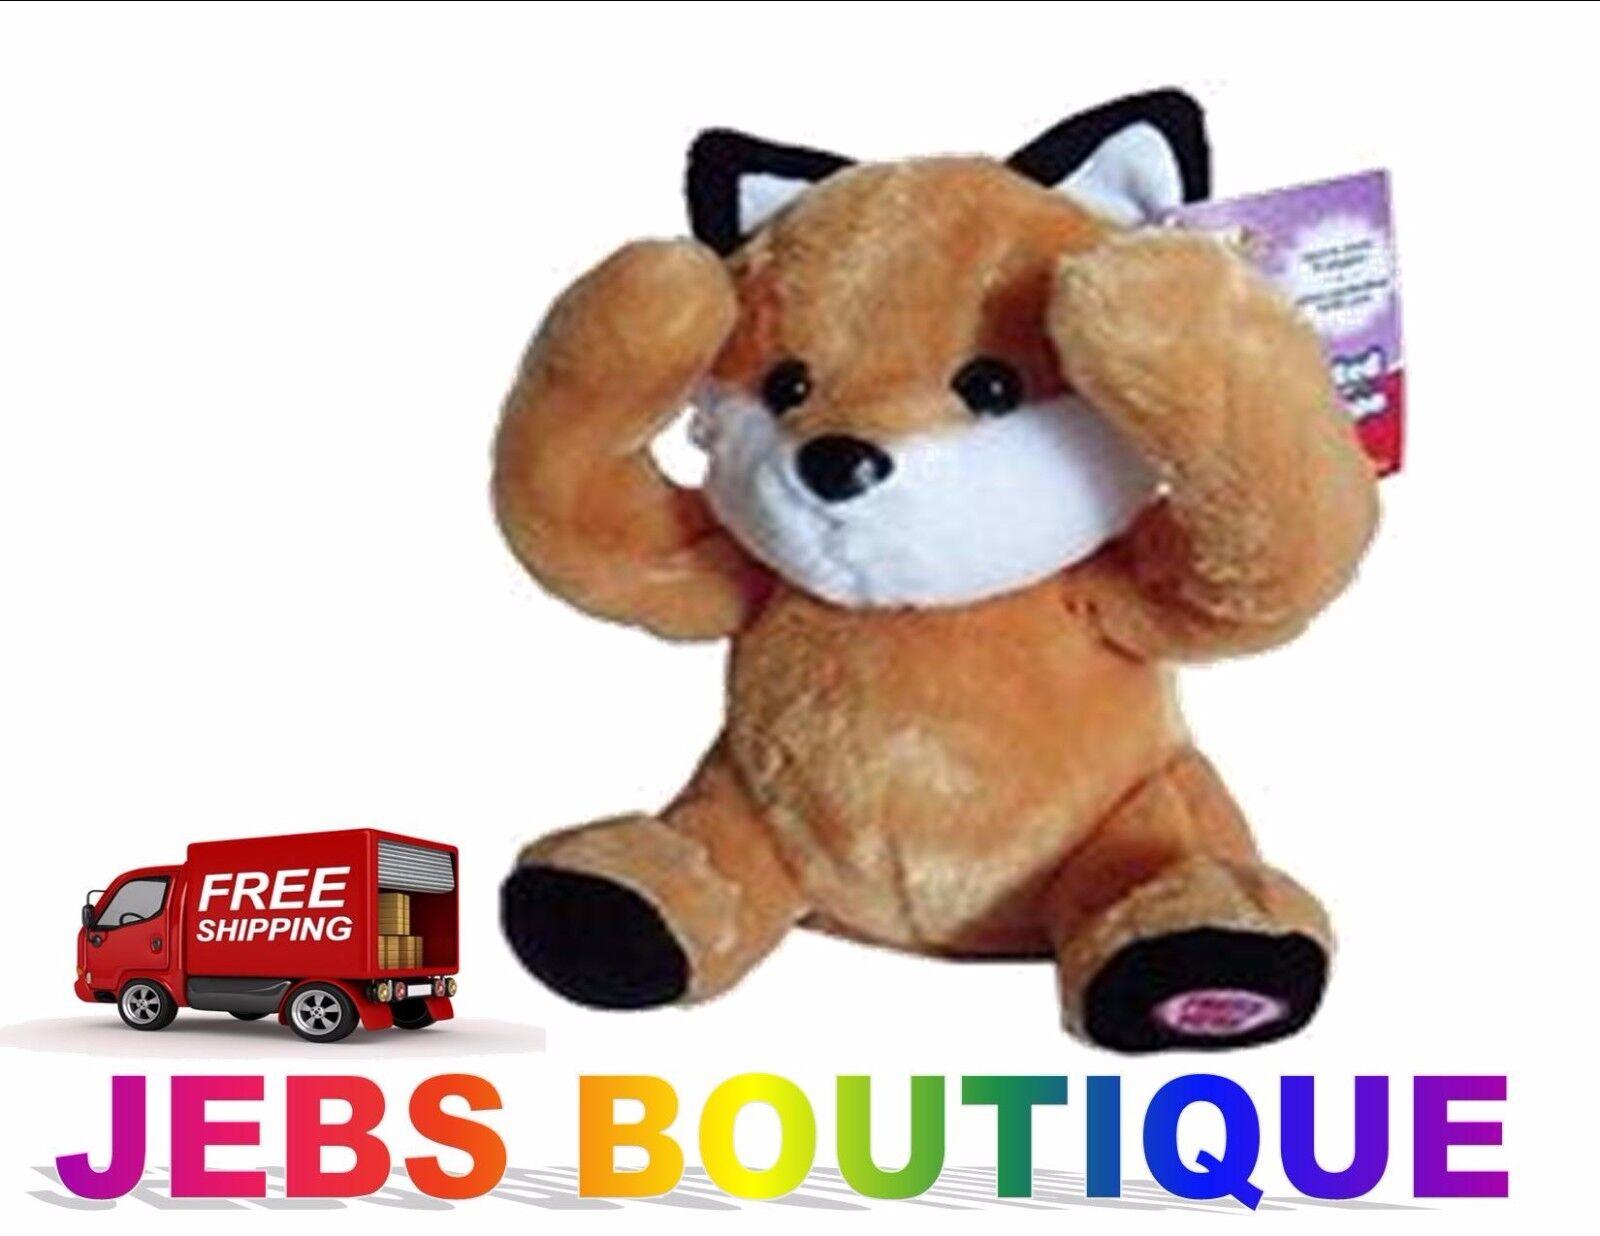 Play Right Peek-a-boo plush animated animal orange Fox plays peekaboo and talks